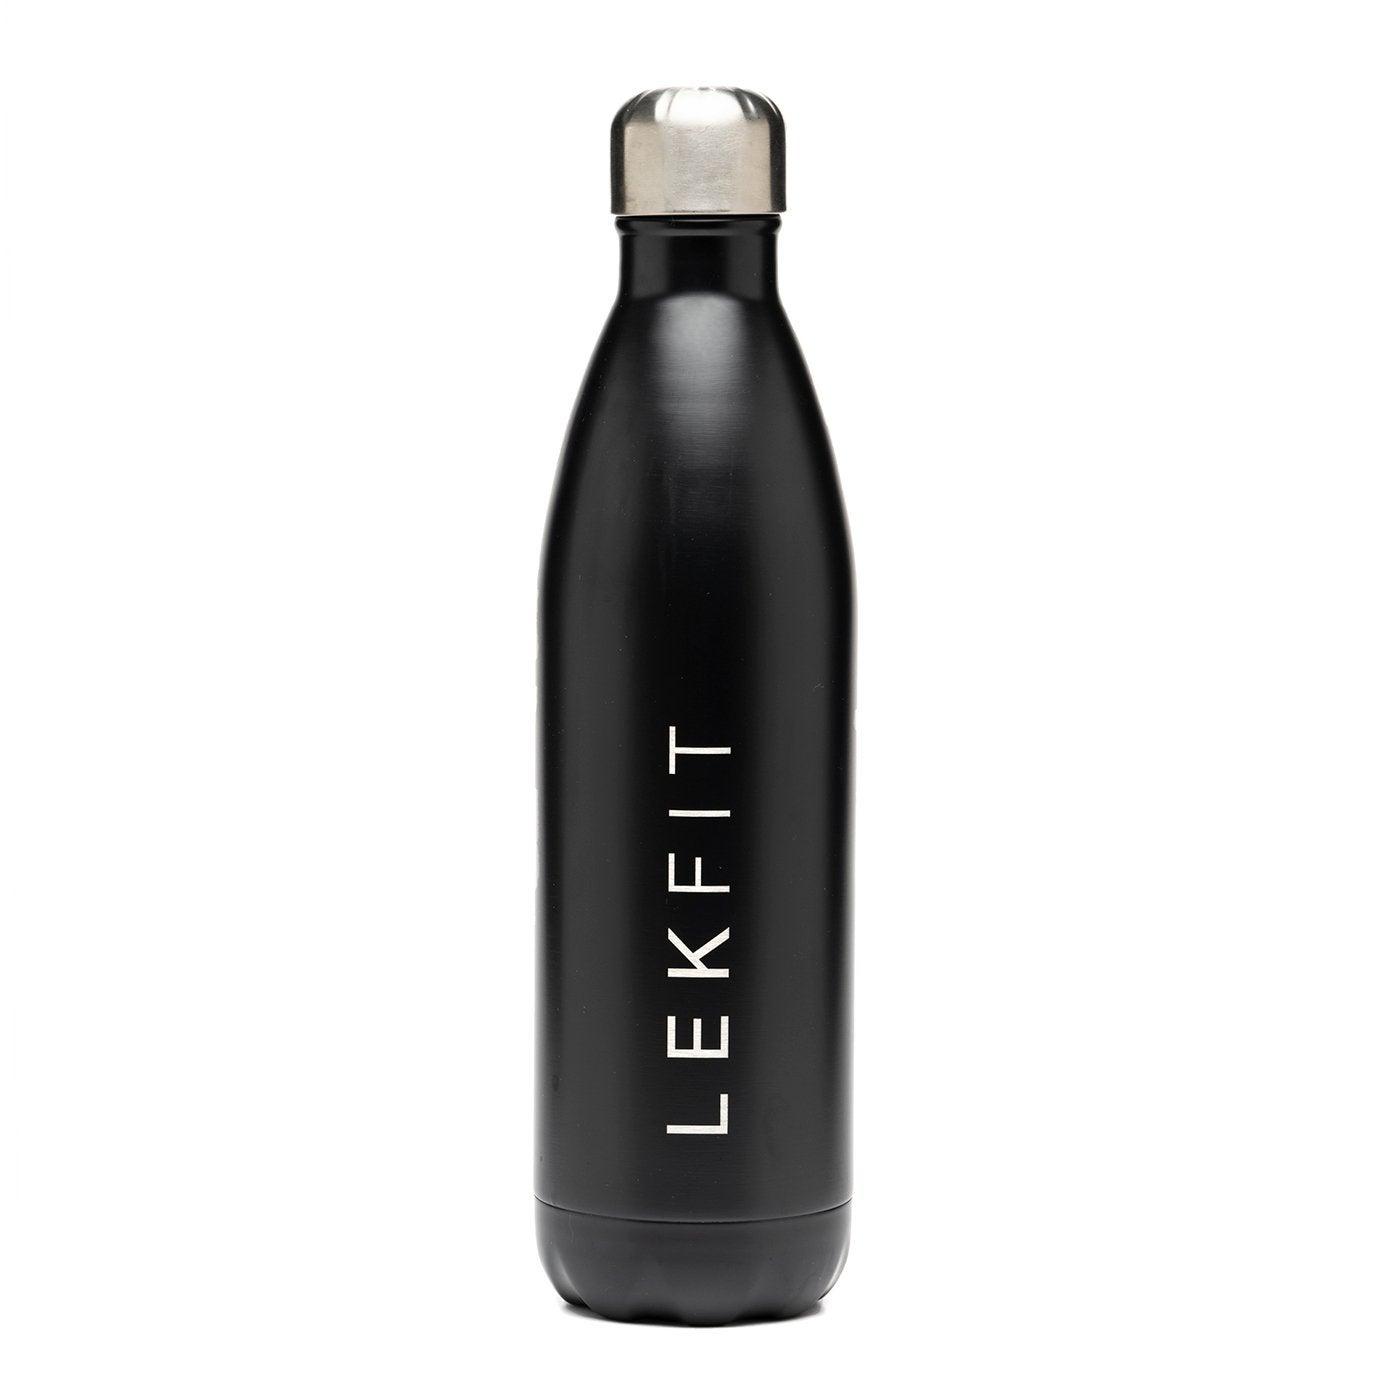 LEKFIT-x-Swell-Bottle_2048x